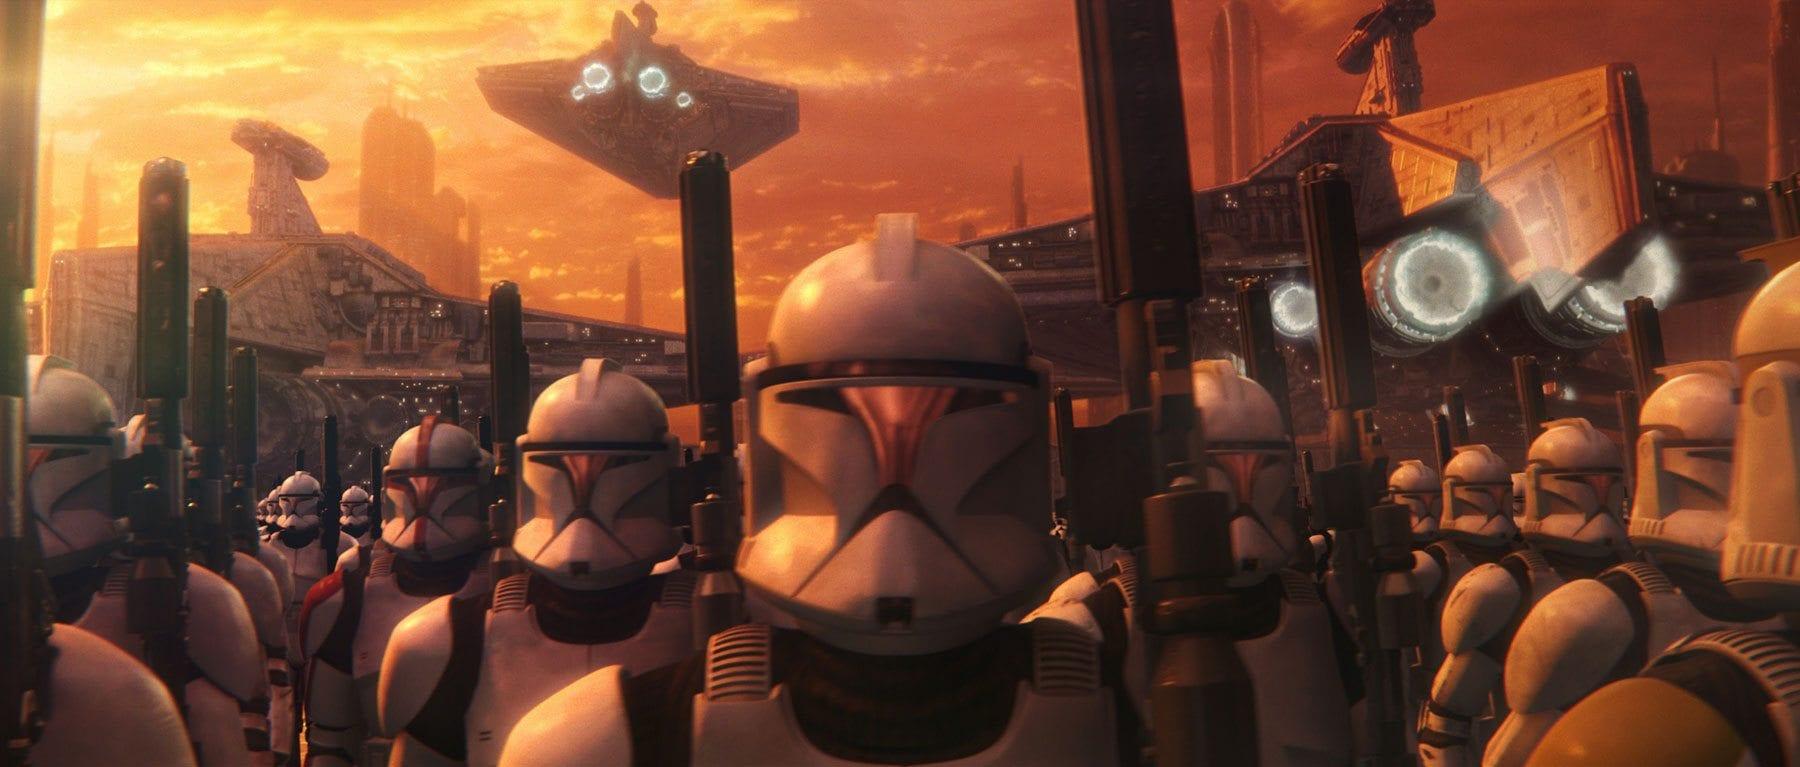 Grand army- Star Wars politics